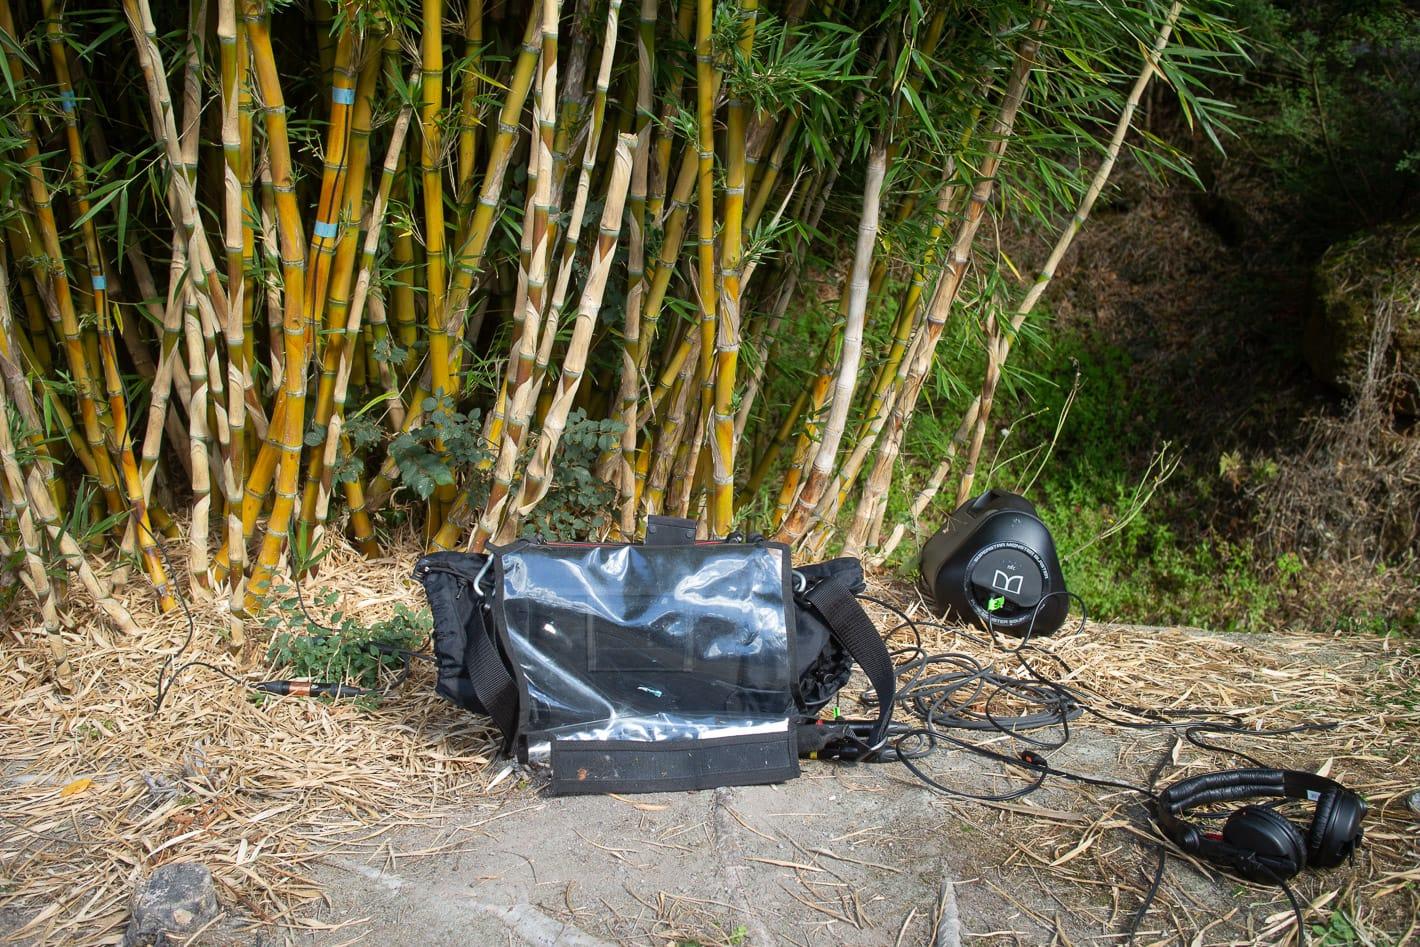 the bamboo setup